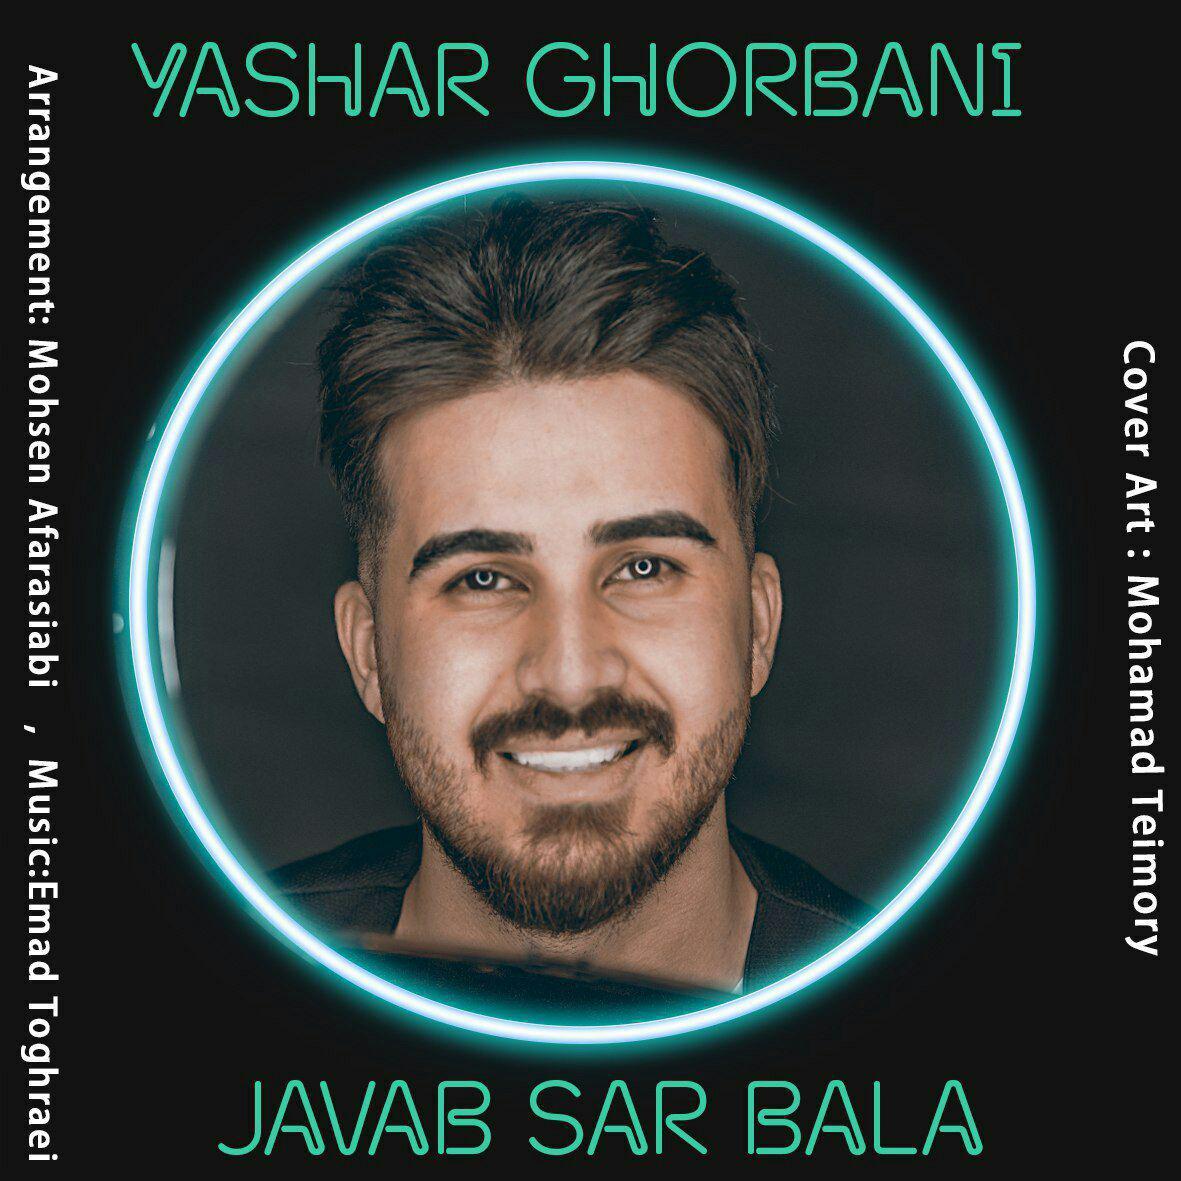 یاشار قربانی جواب سر بالا Yashar Ghorbani Javab Sar Bala